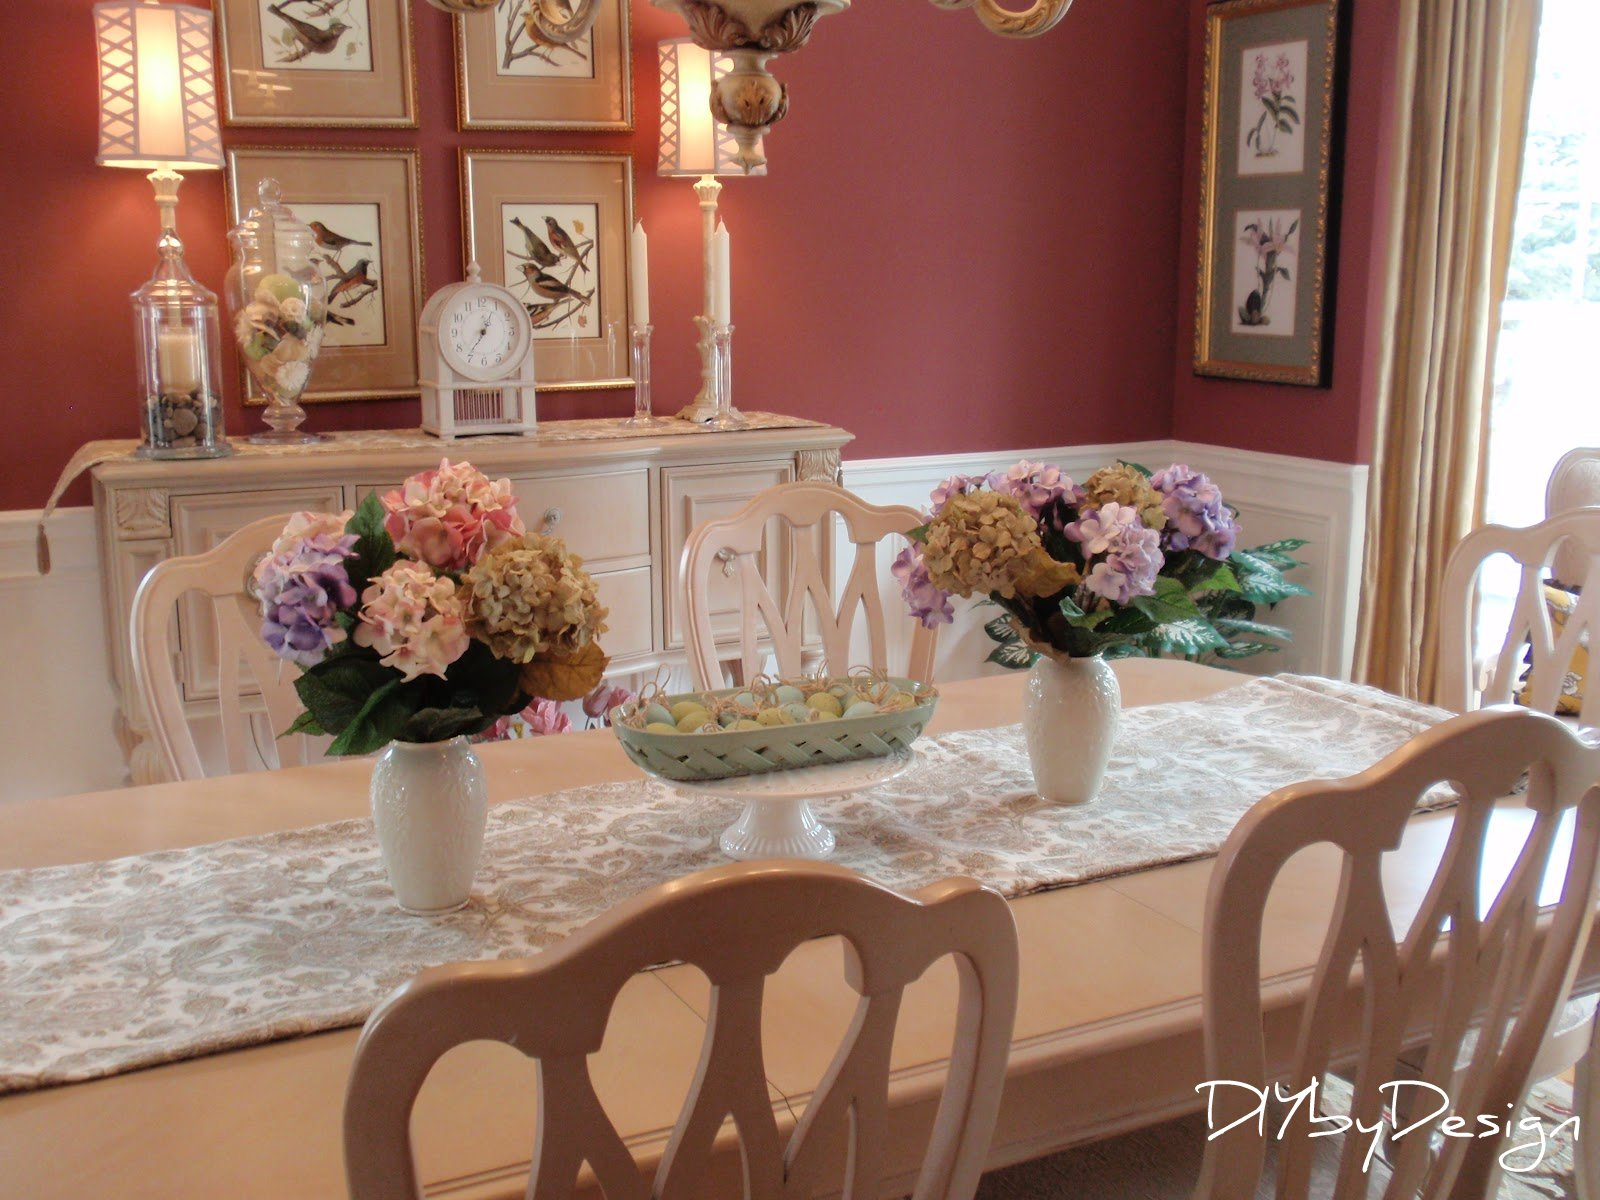 DIY by Design: Springing up the Dining Room